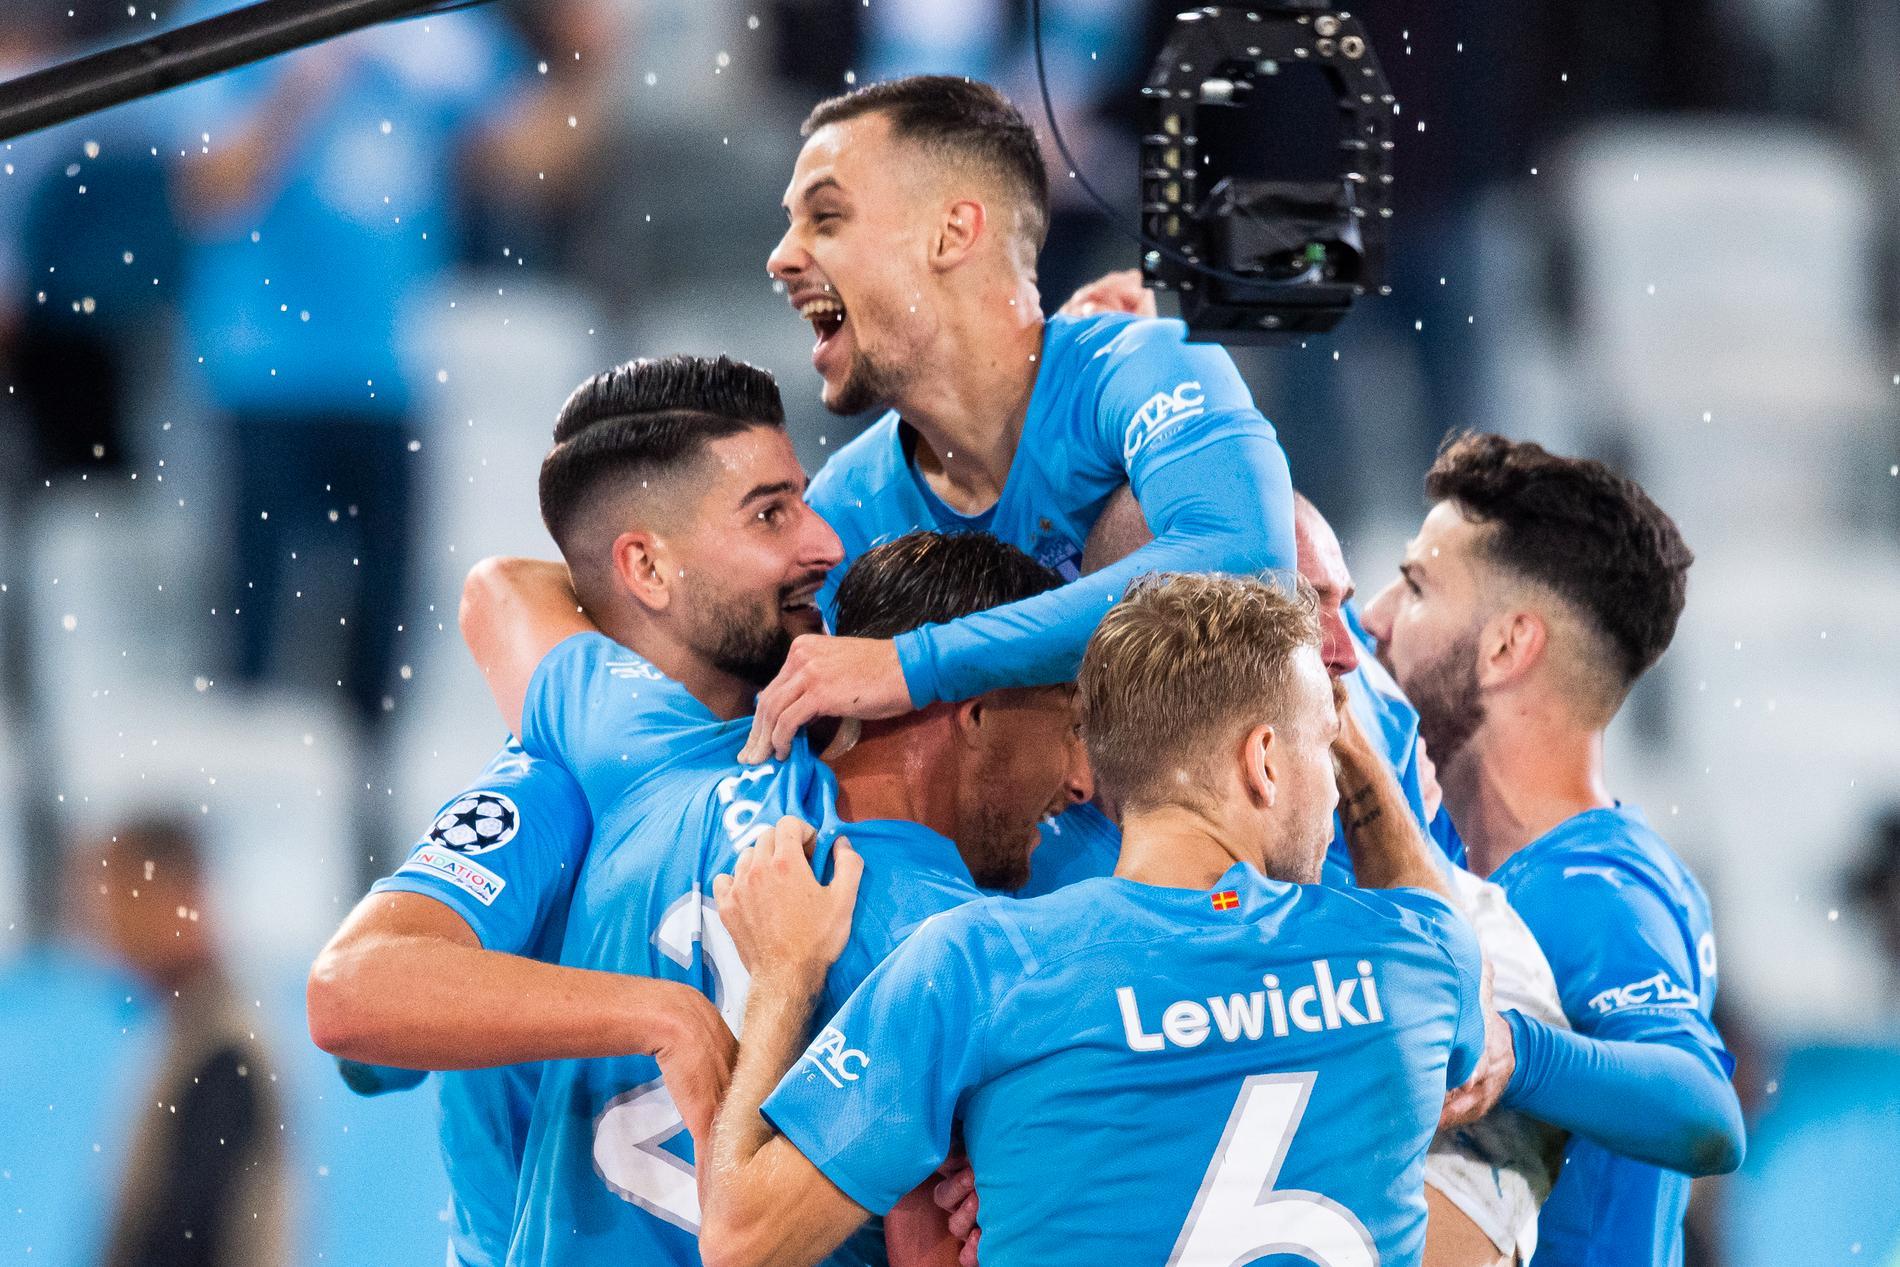 Berget, Colak, Birmancevic, Lewicki och Rakip firar mål mot Ludogorets.